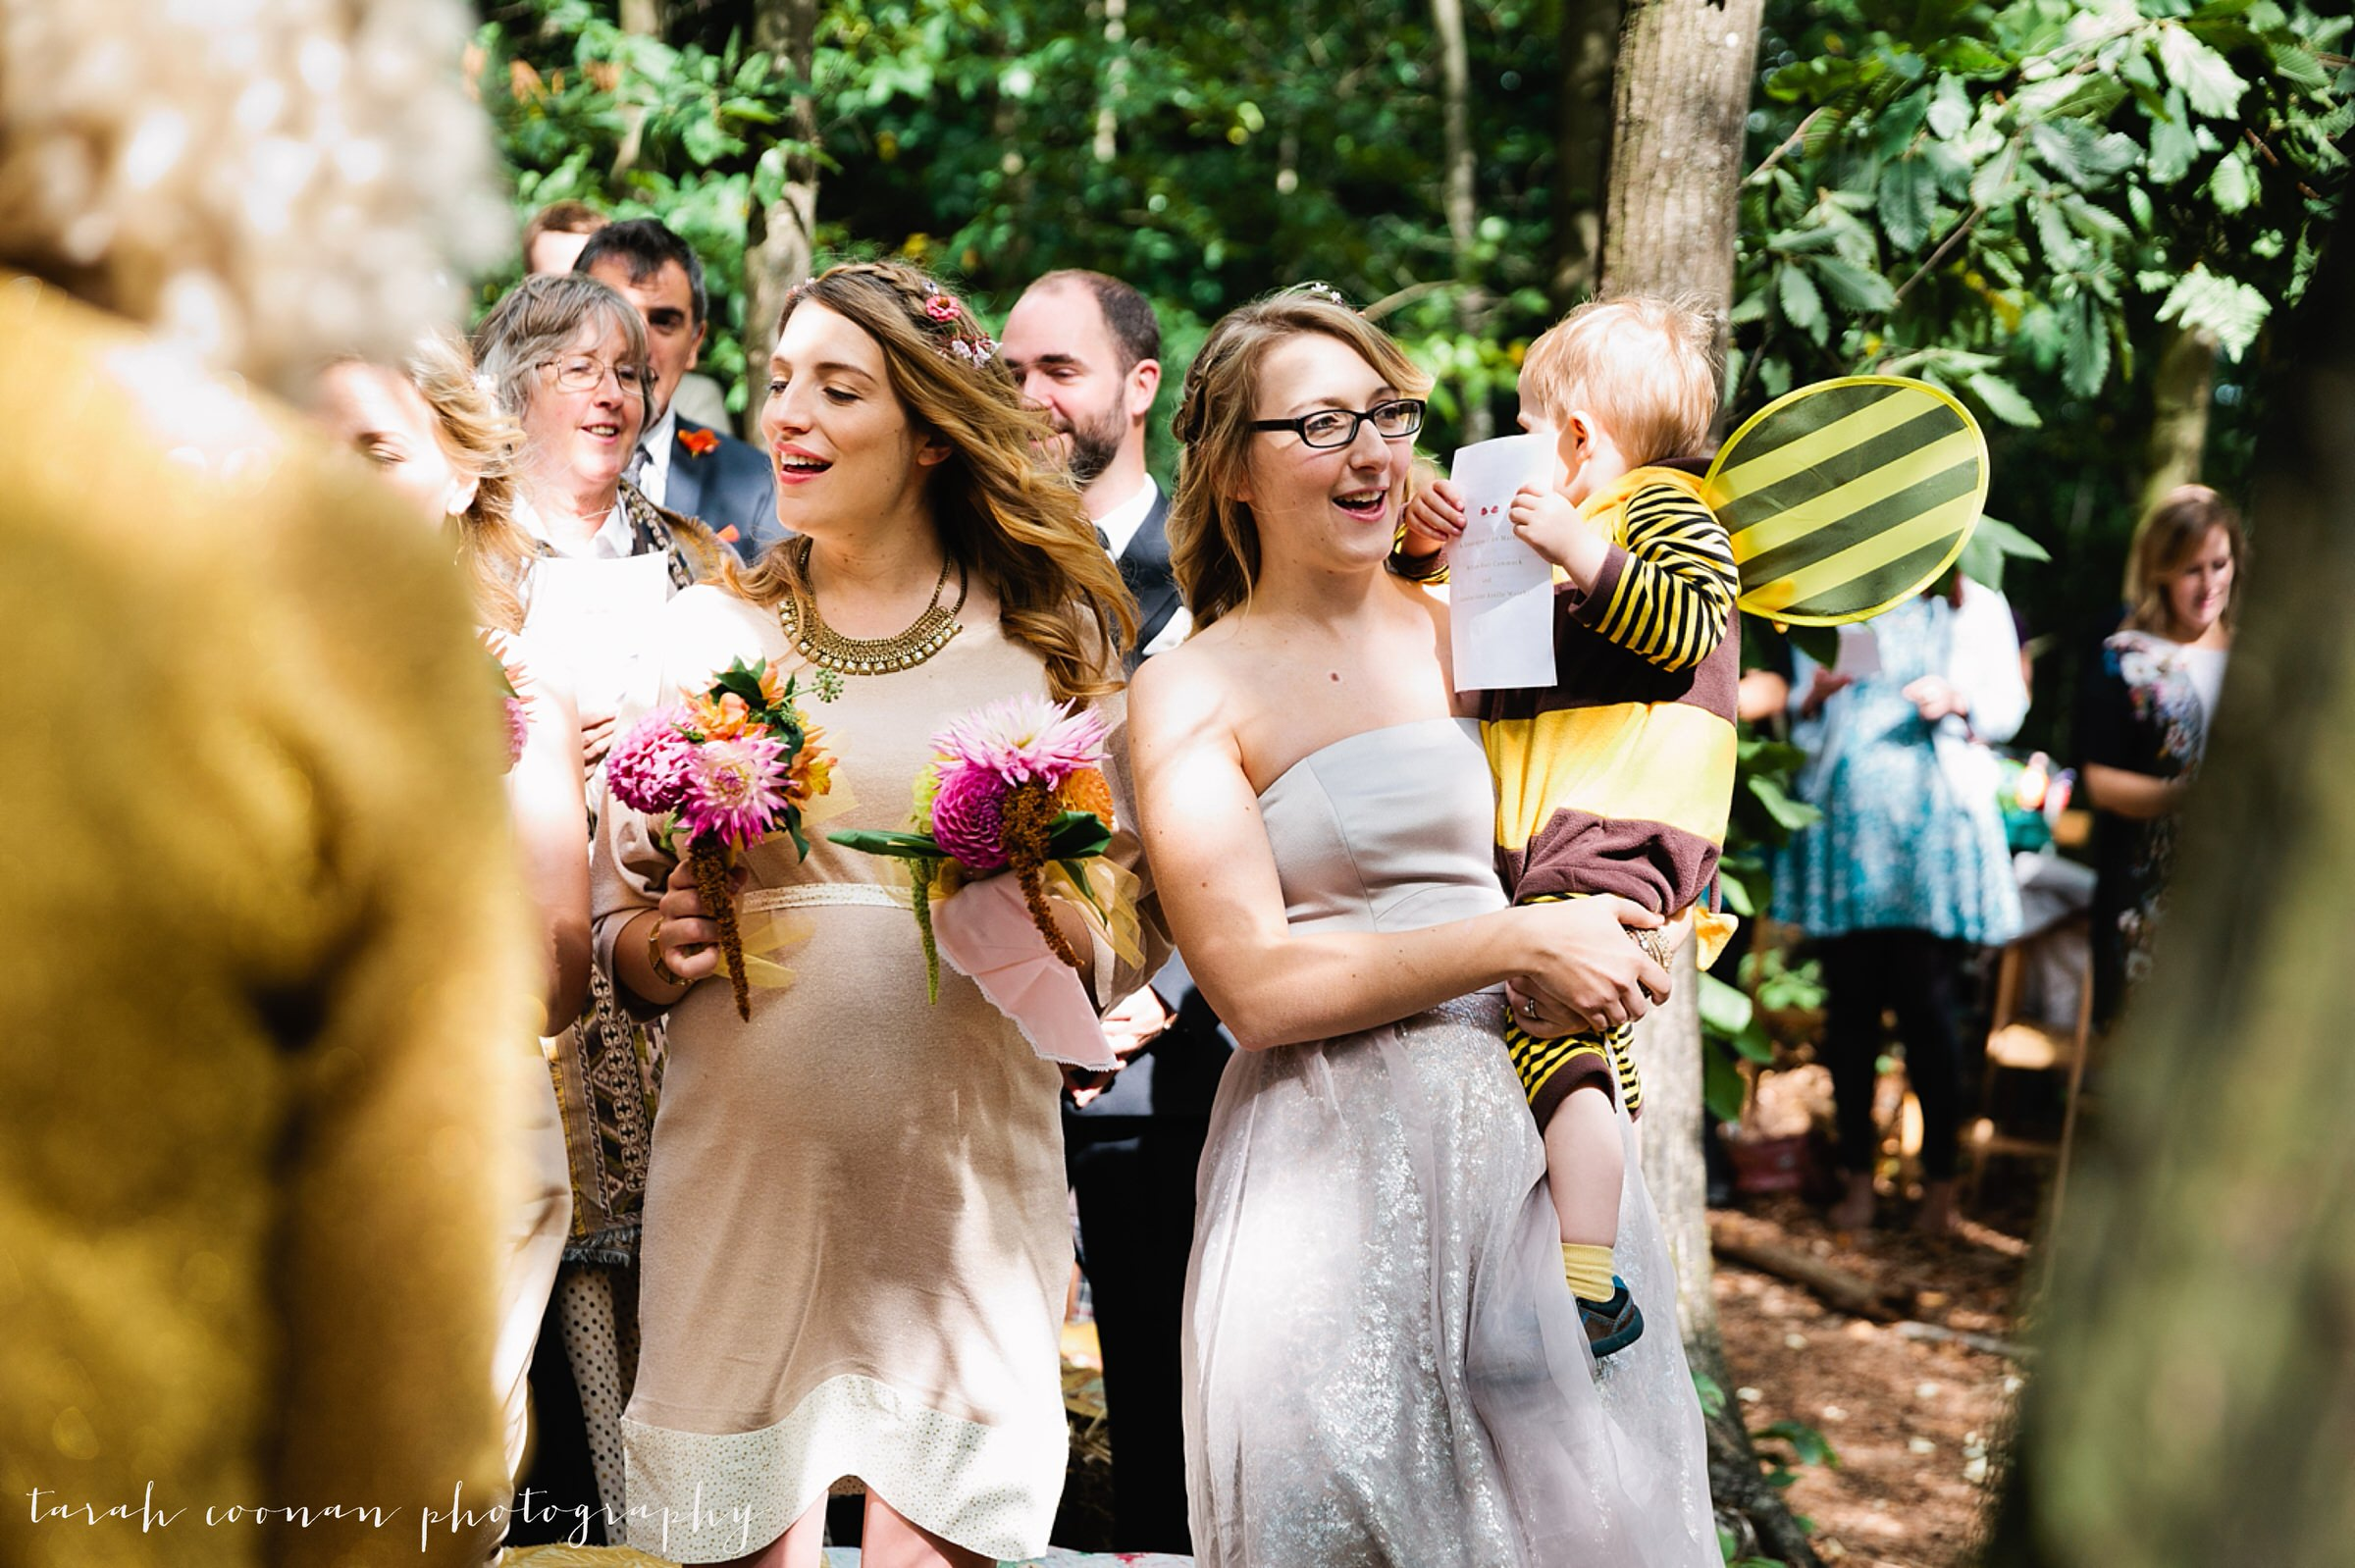 mismatching bridesmaid dresses